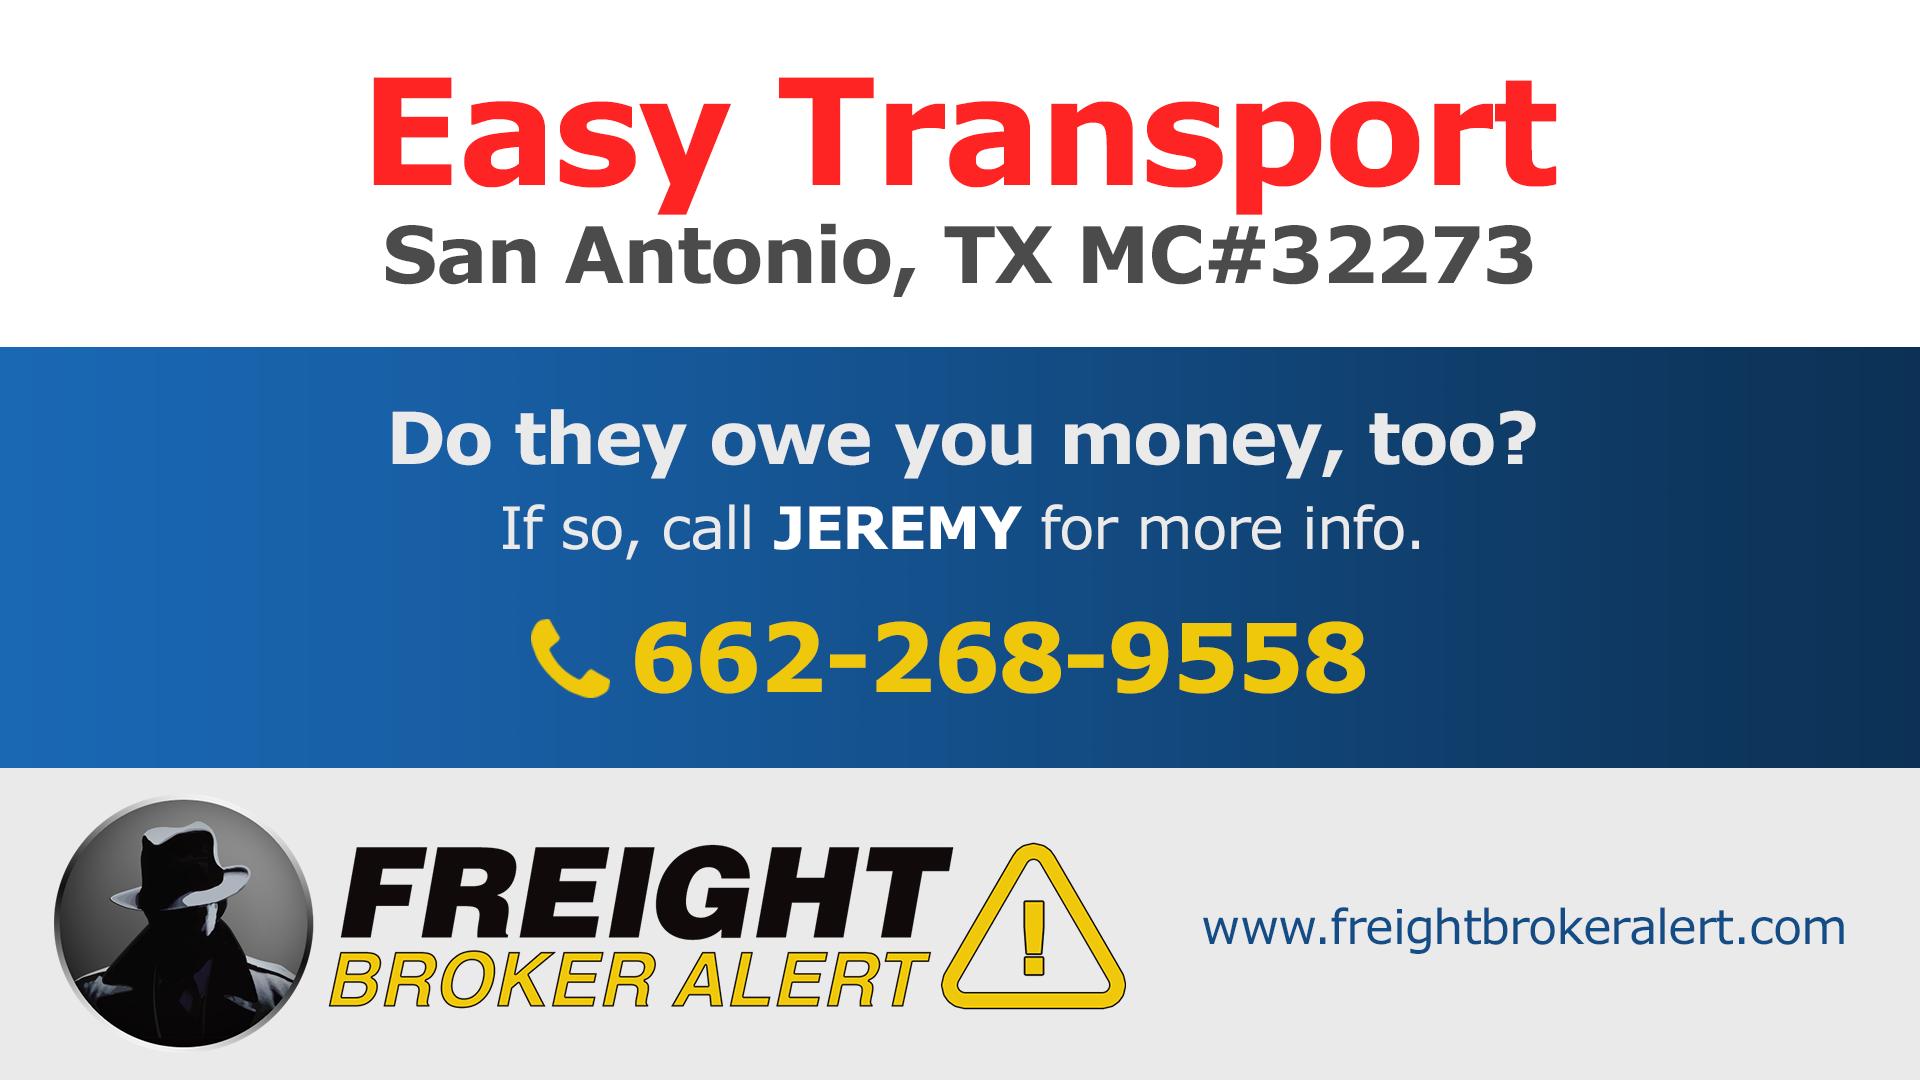 Easy Transport Texas